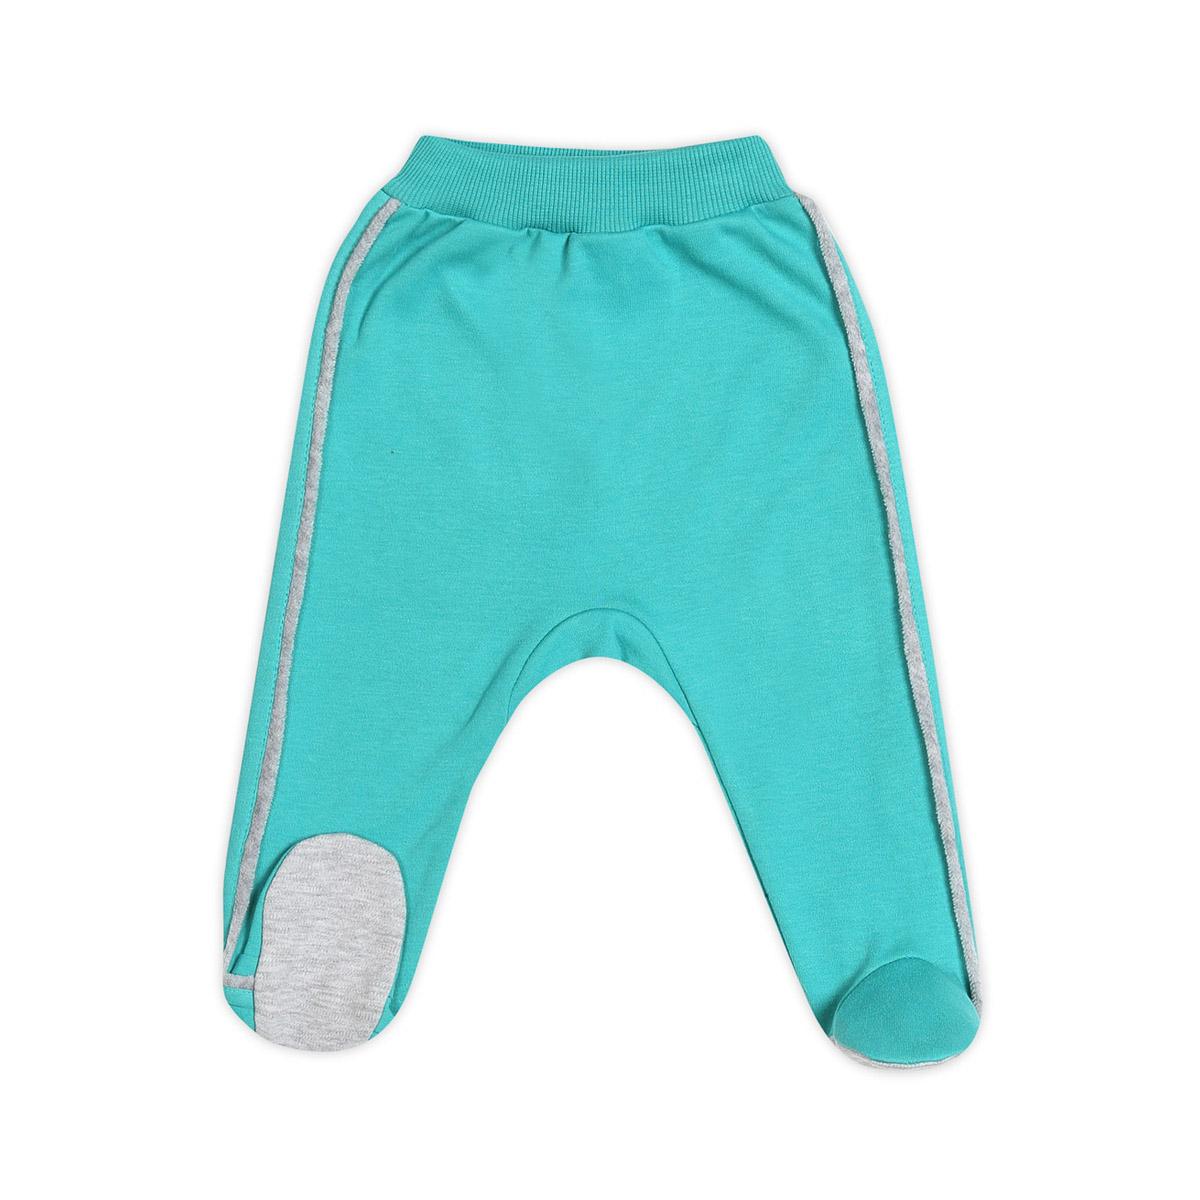 Ползунки с ножками Ёмаё Спорт (26-265) рост 56 ярко-бирюзовый<br>